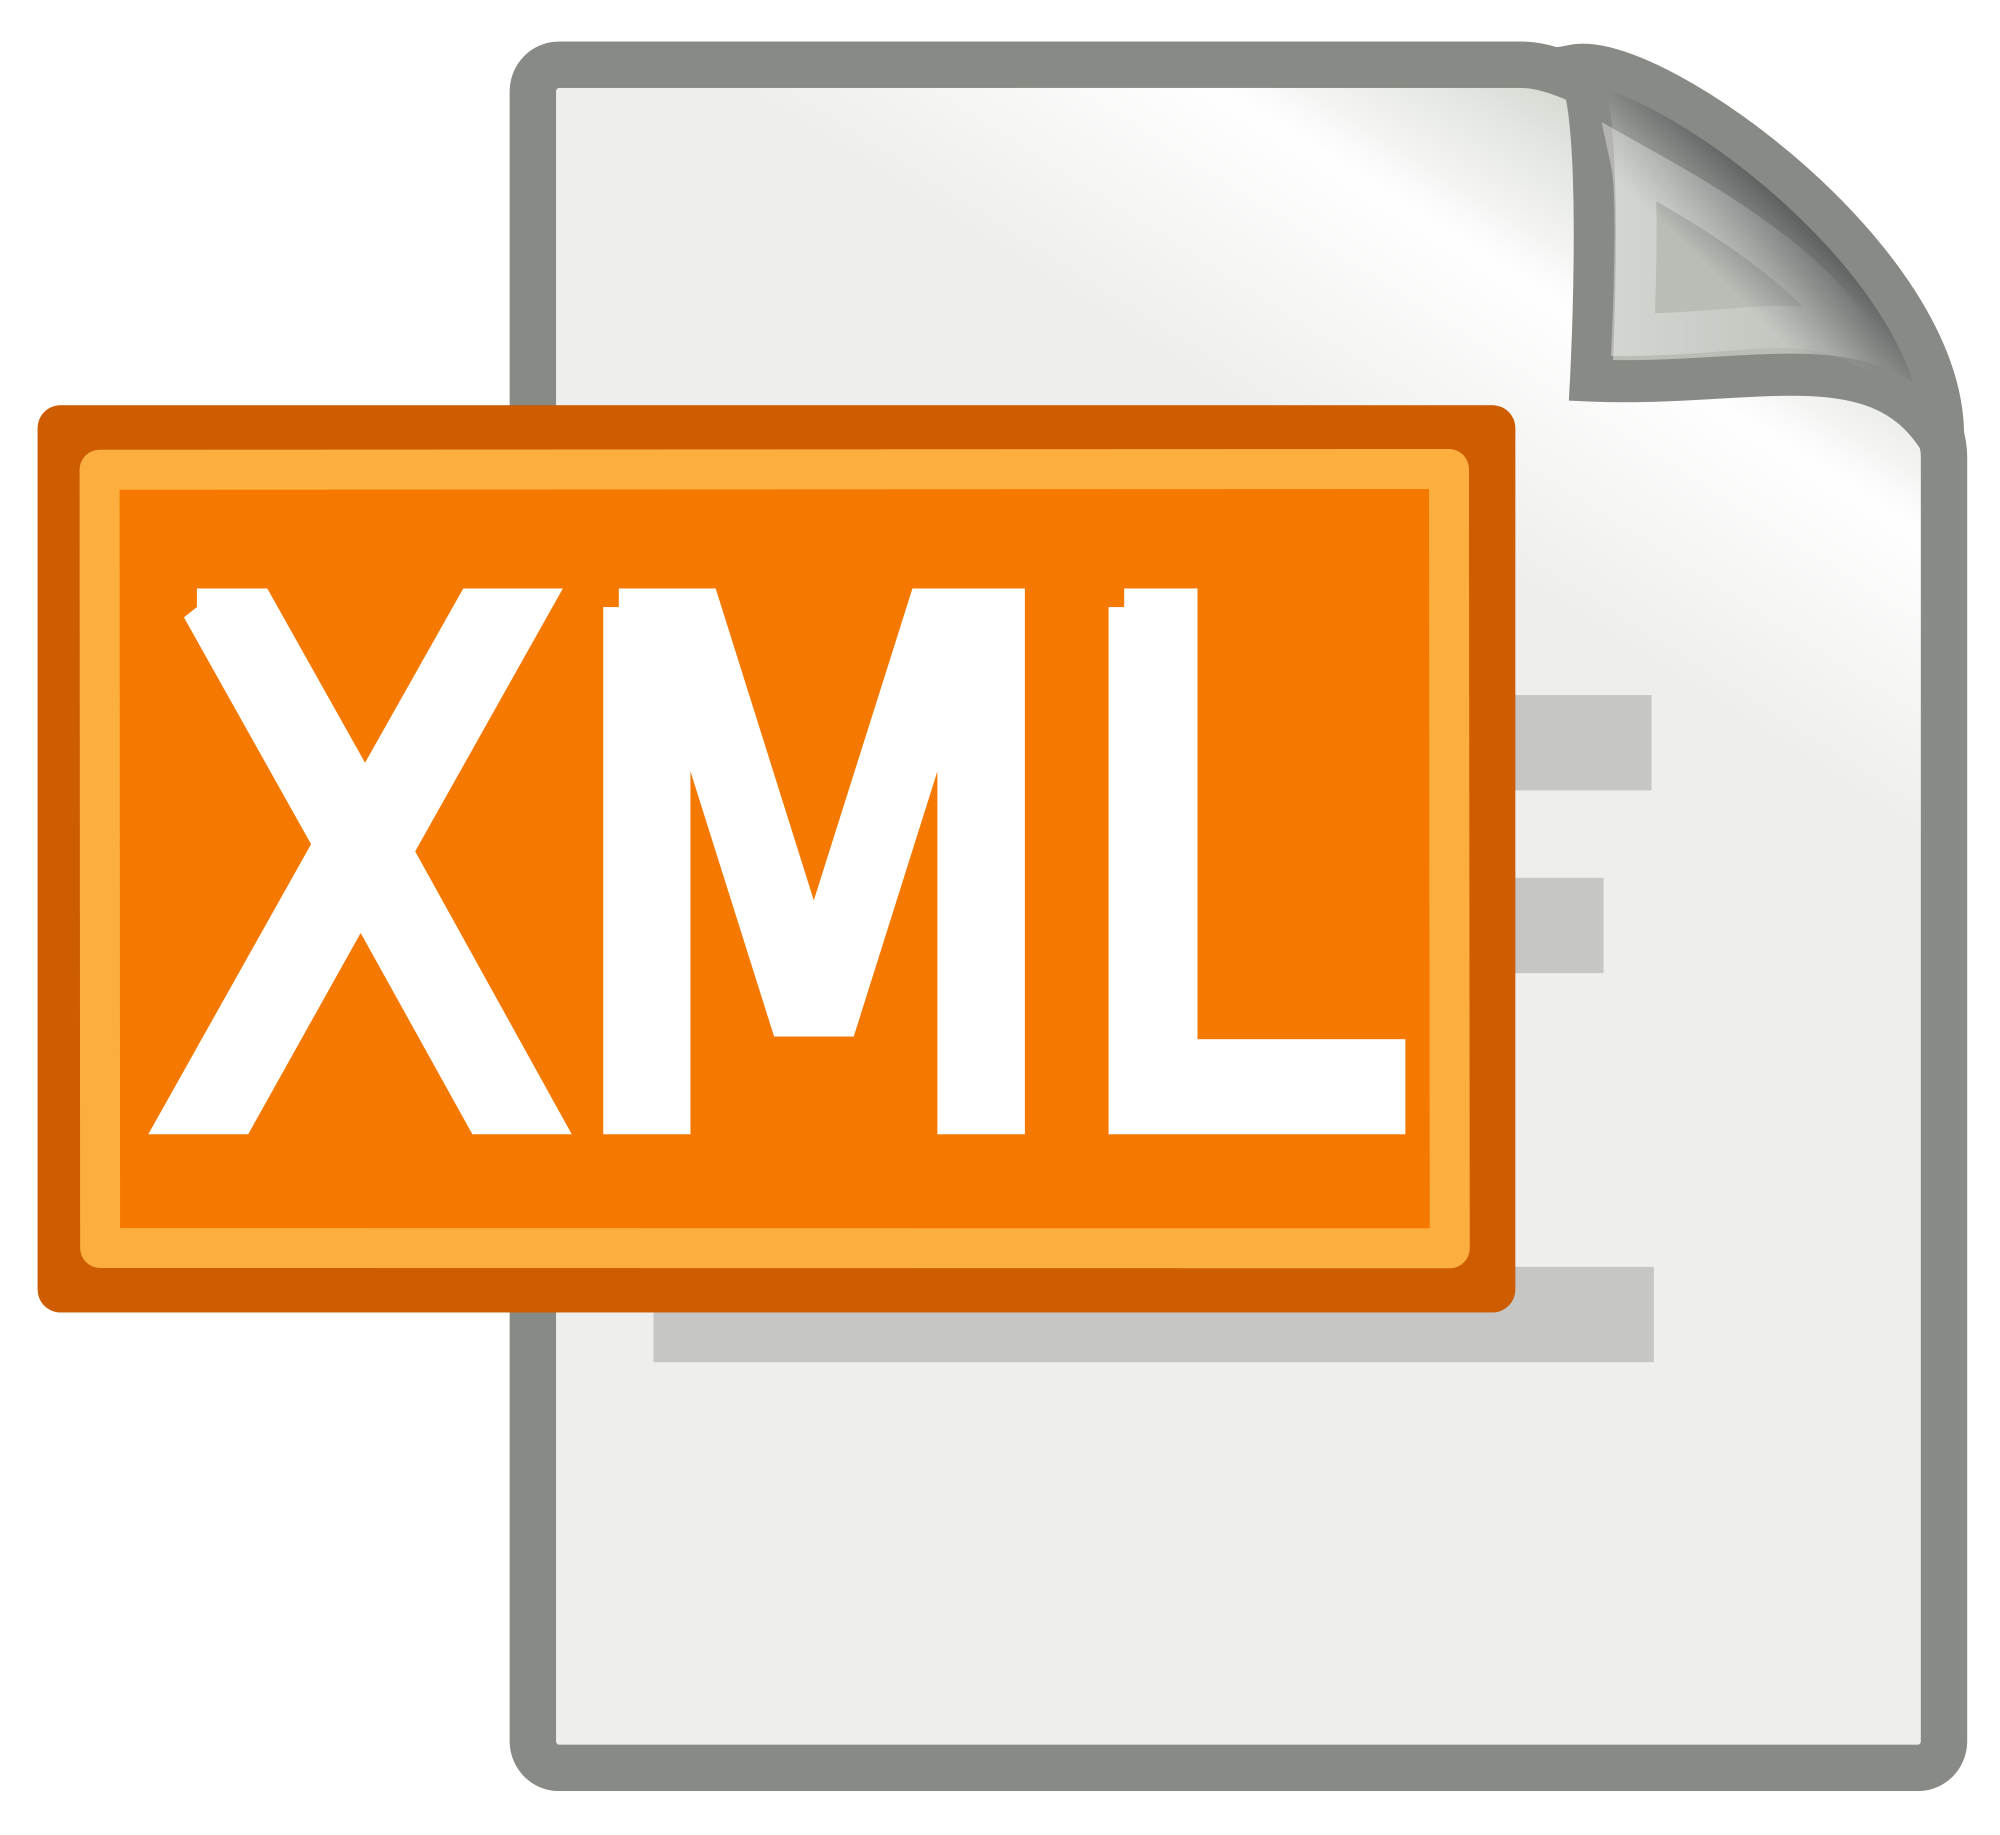 Dịch tài liệu file XML Extensible Markup Language